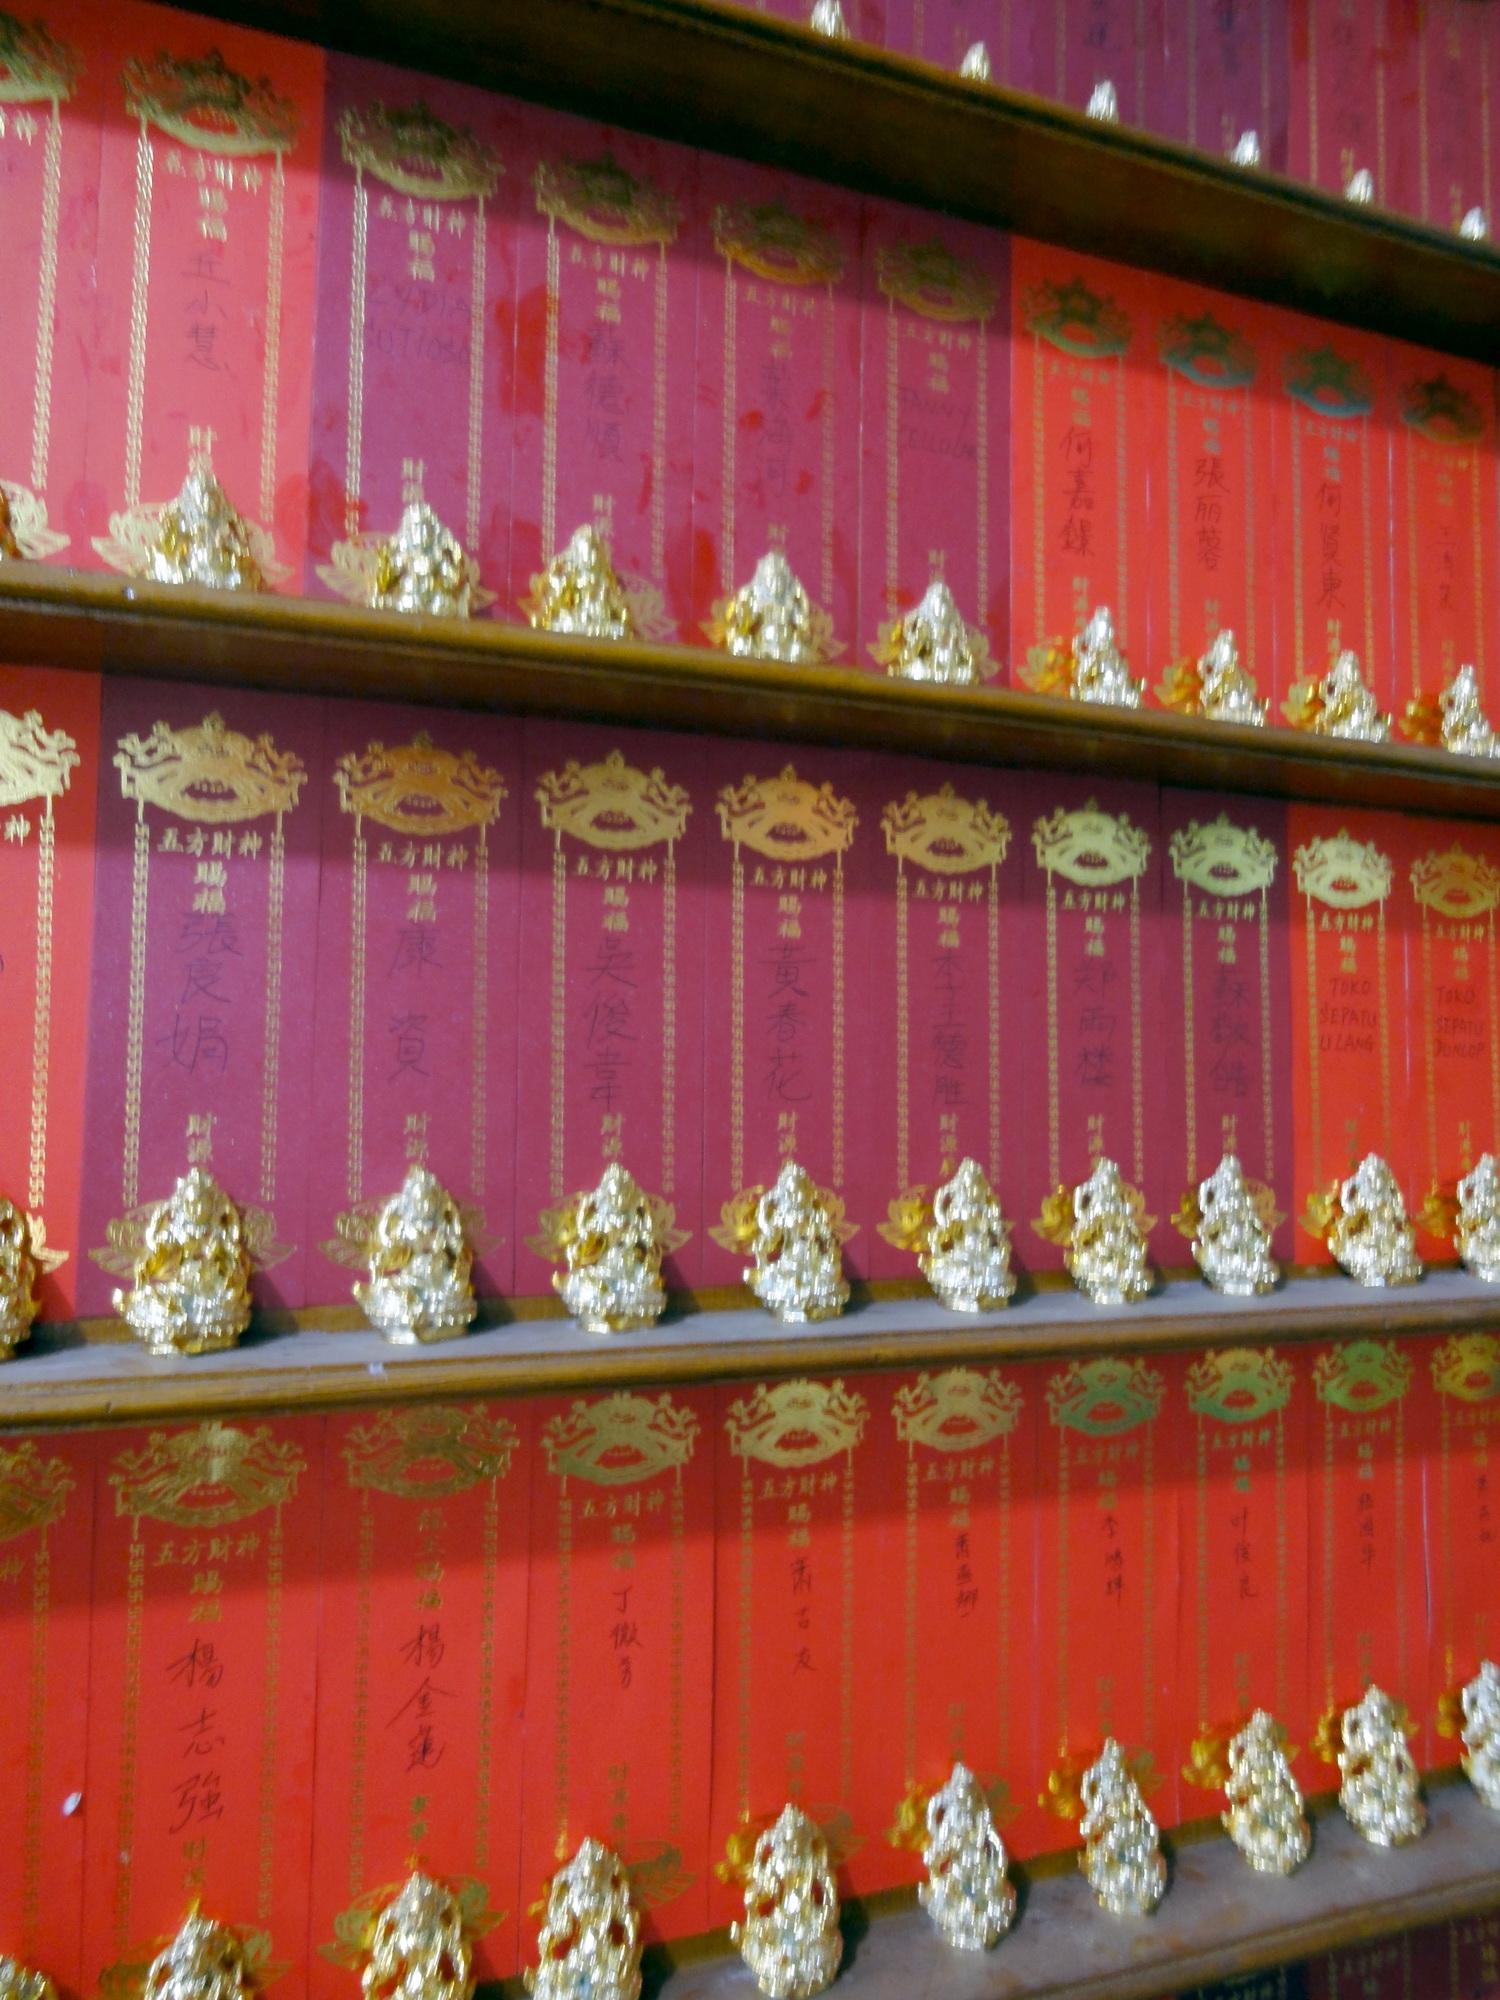 財神殿/Cai Shen Dian